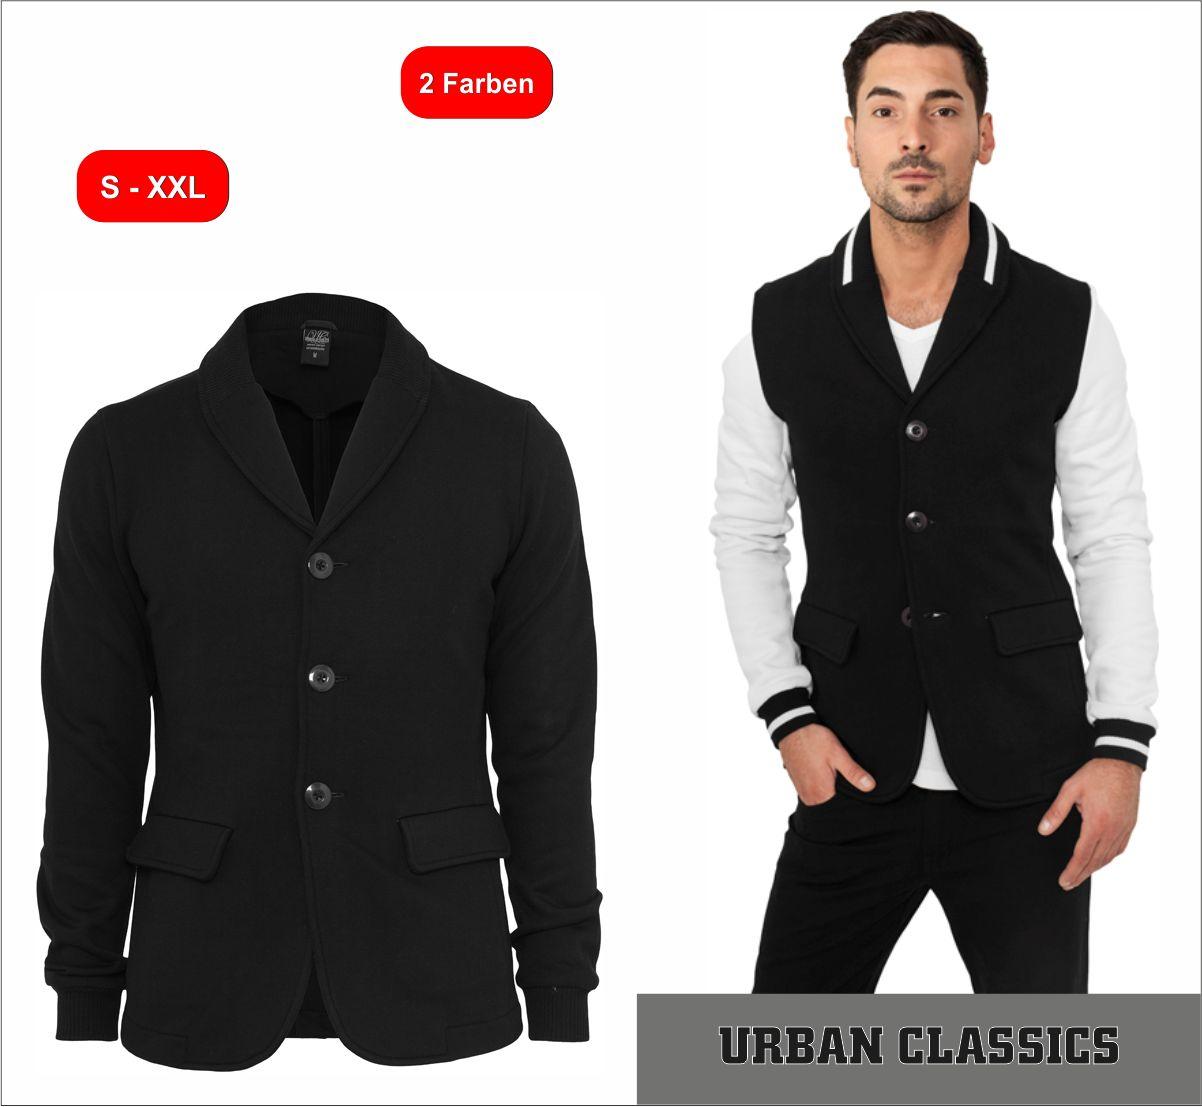 urban classics sweat blazer sakko herren oberteil jacke. Black Bedroom Furniture Sets. Home Design Ideas